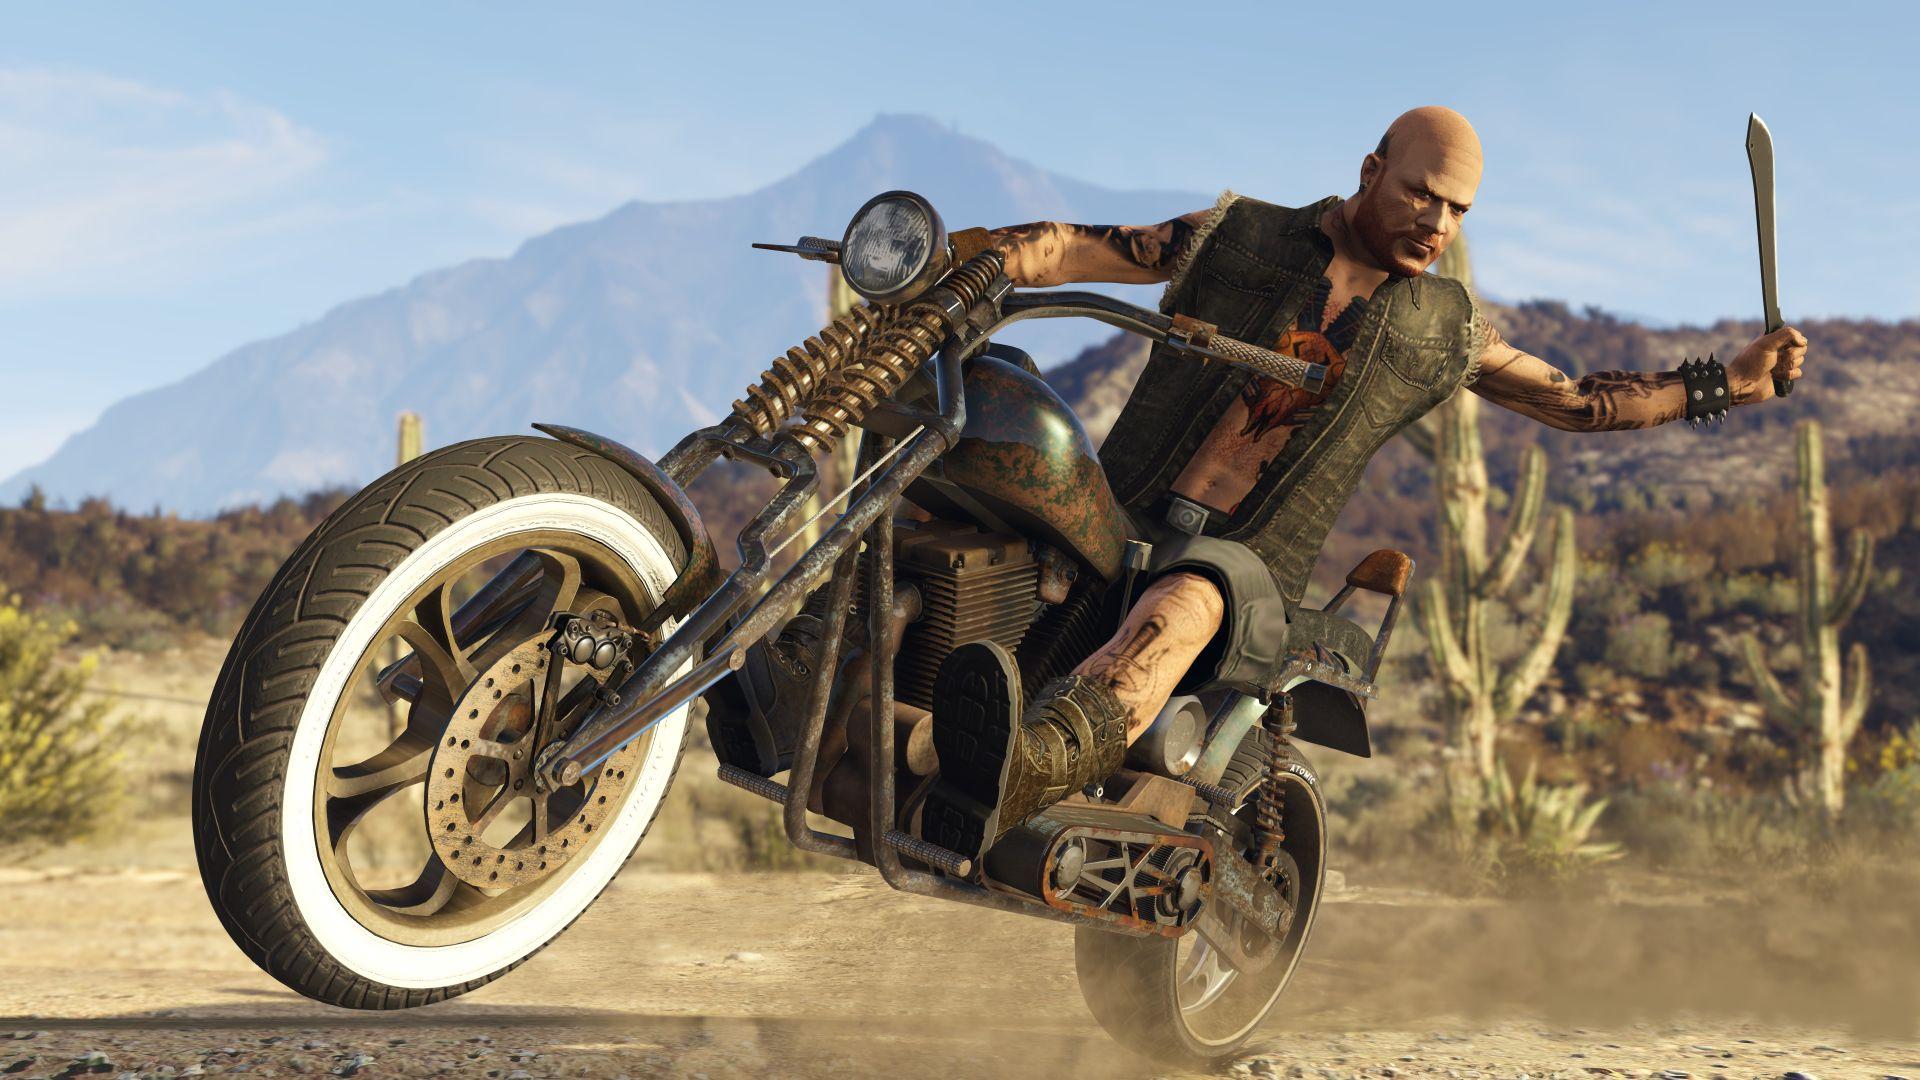 wallpaper gta online: bikers, gta, gta 5, best games, games #11821